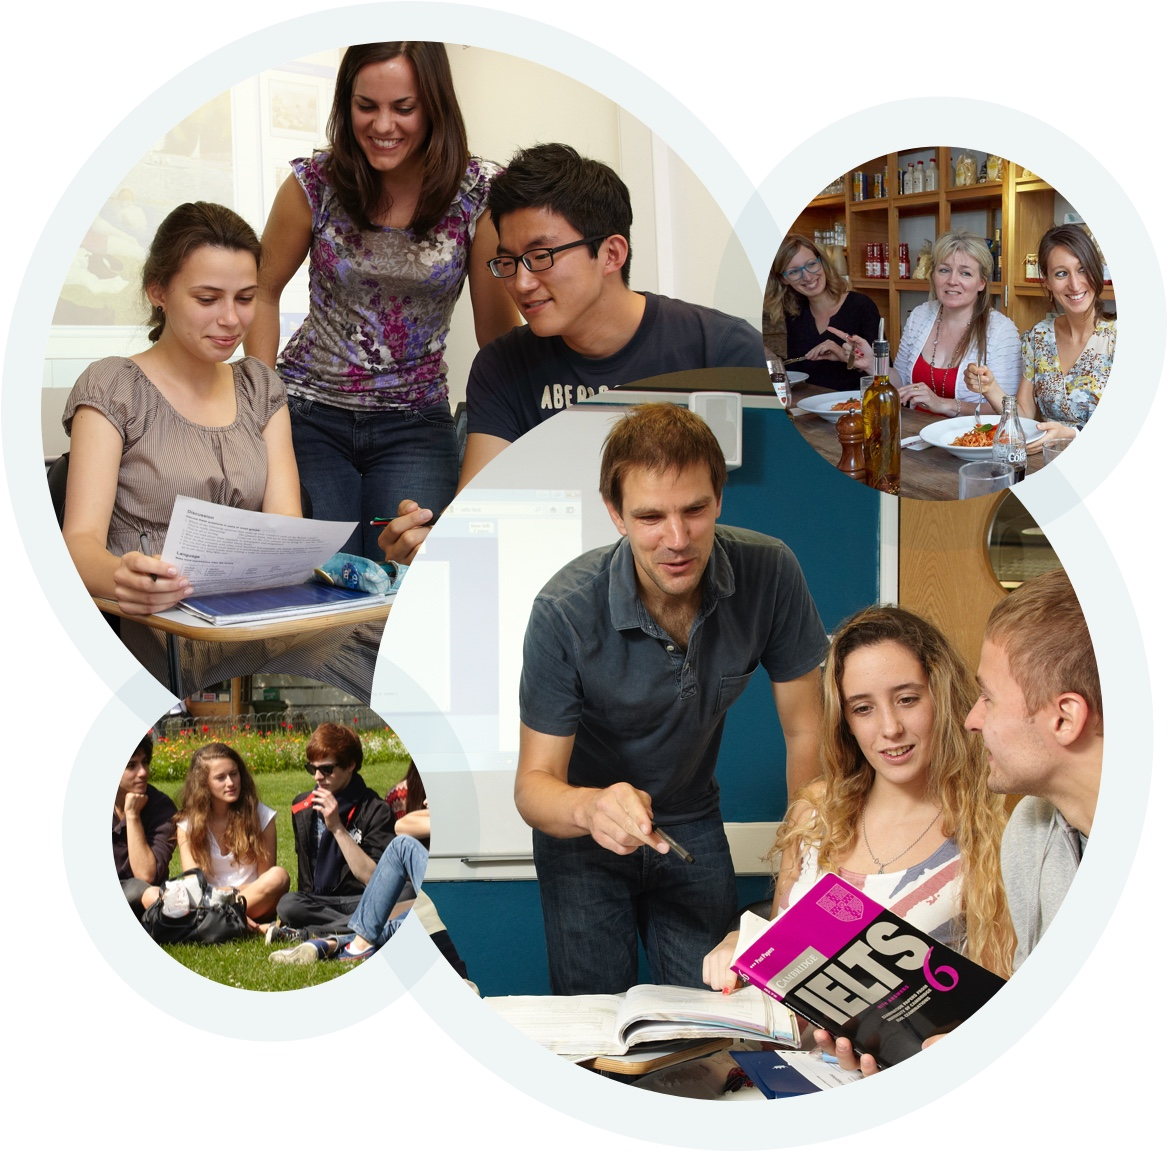 English School Dublin | Central School of English